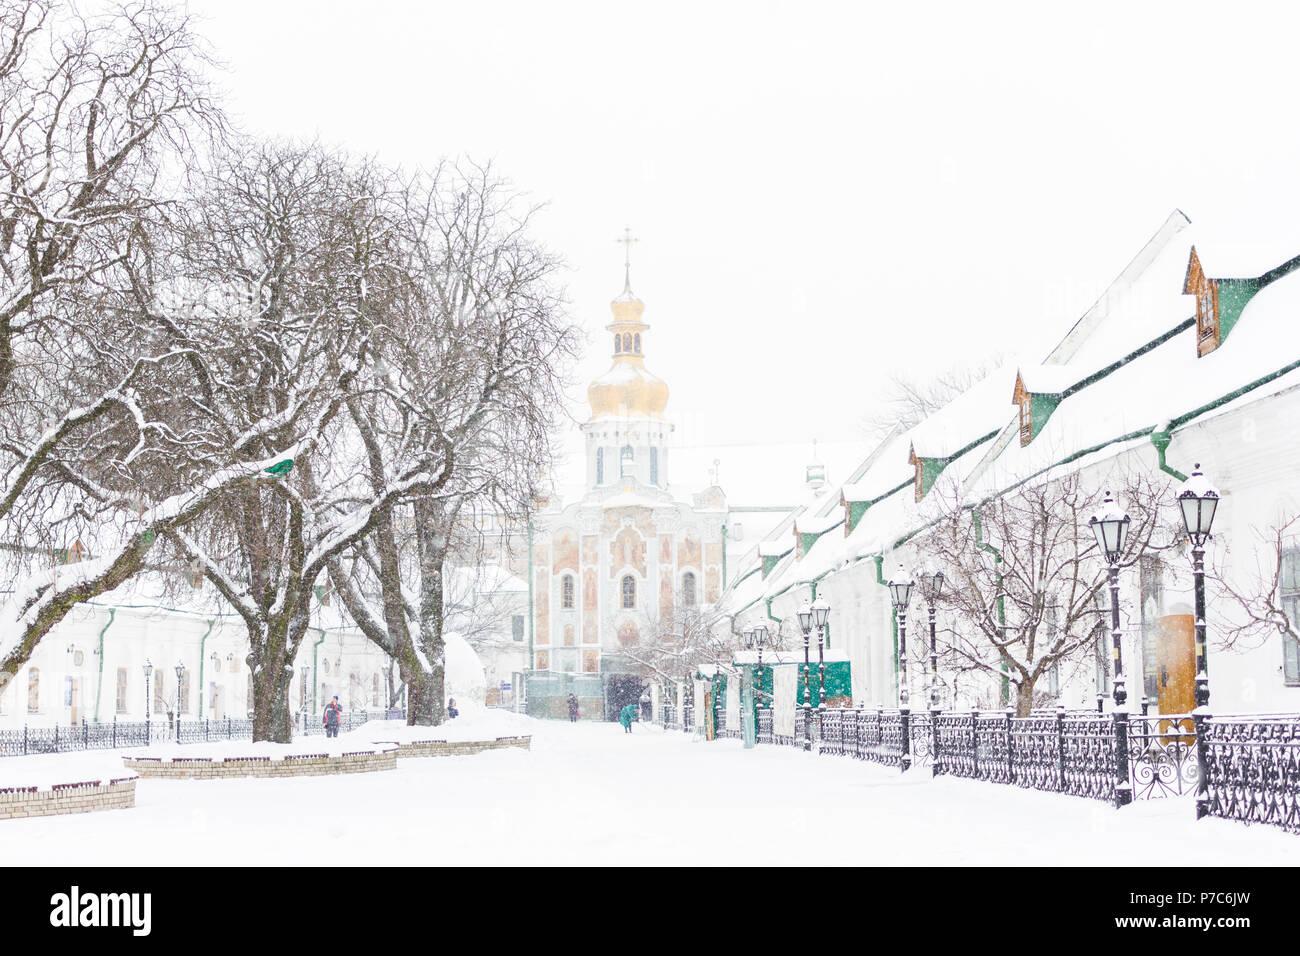 Entrance gate of the Pechersk Lavra in Kiev, Ukraine. The Gate Church of the Trinity in winter snow Stock Photo